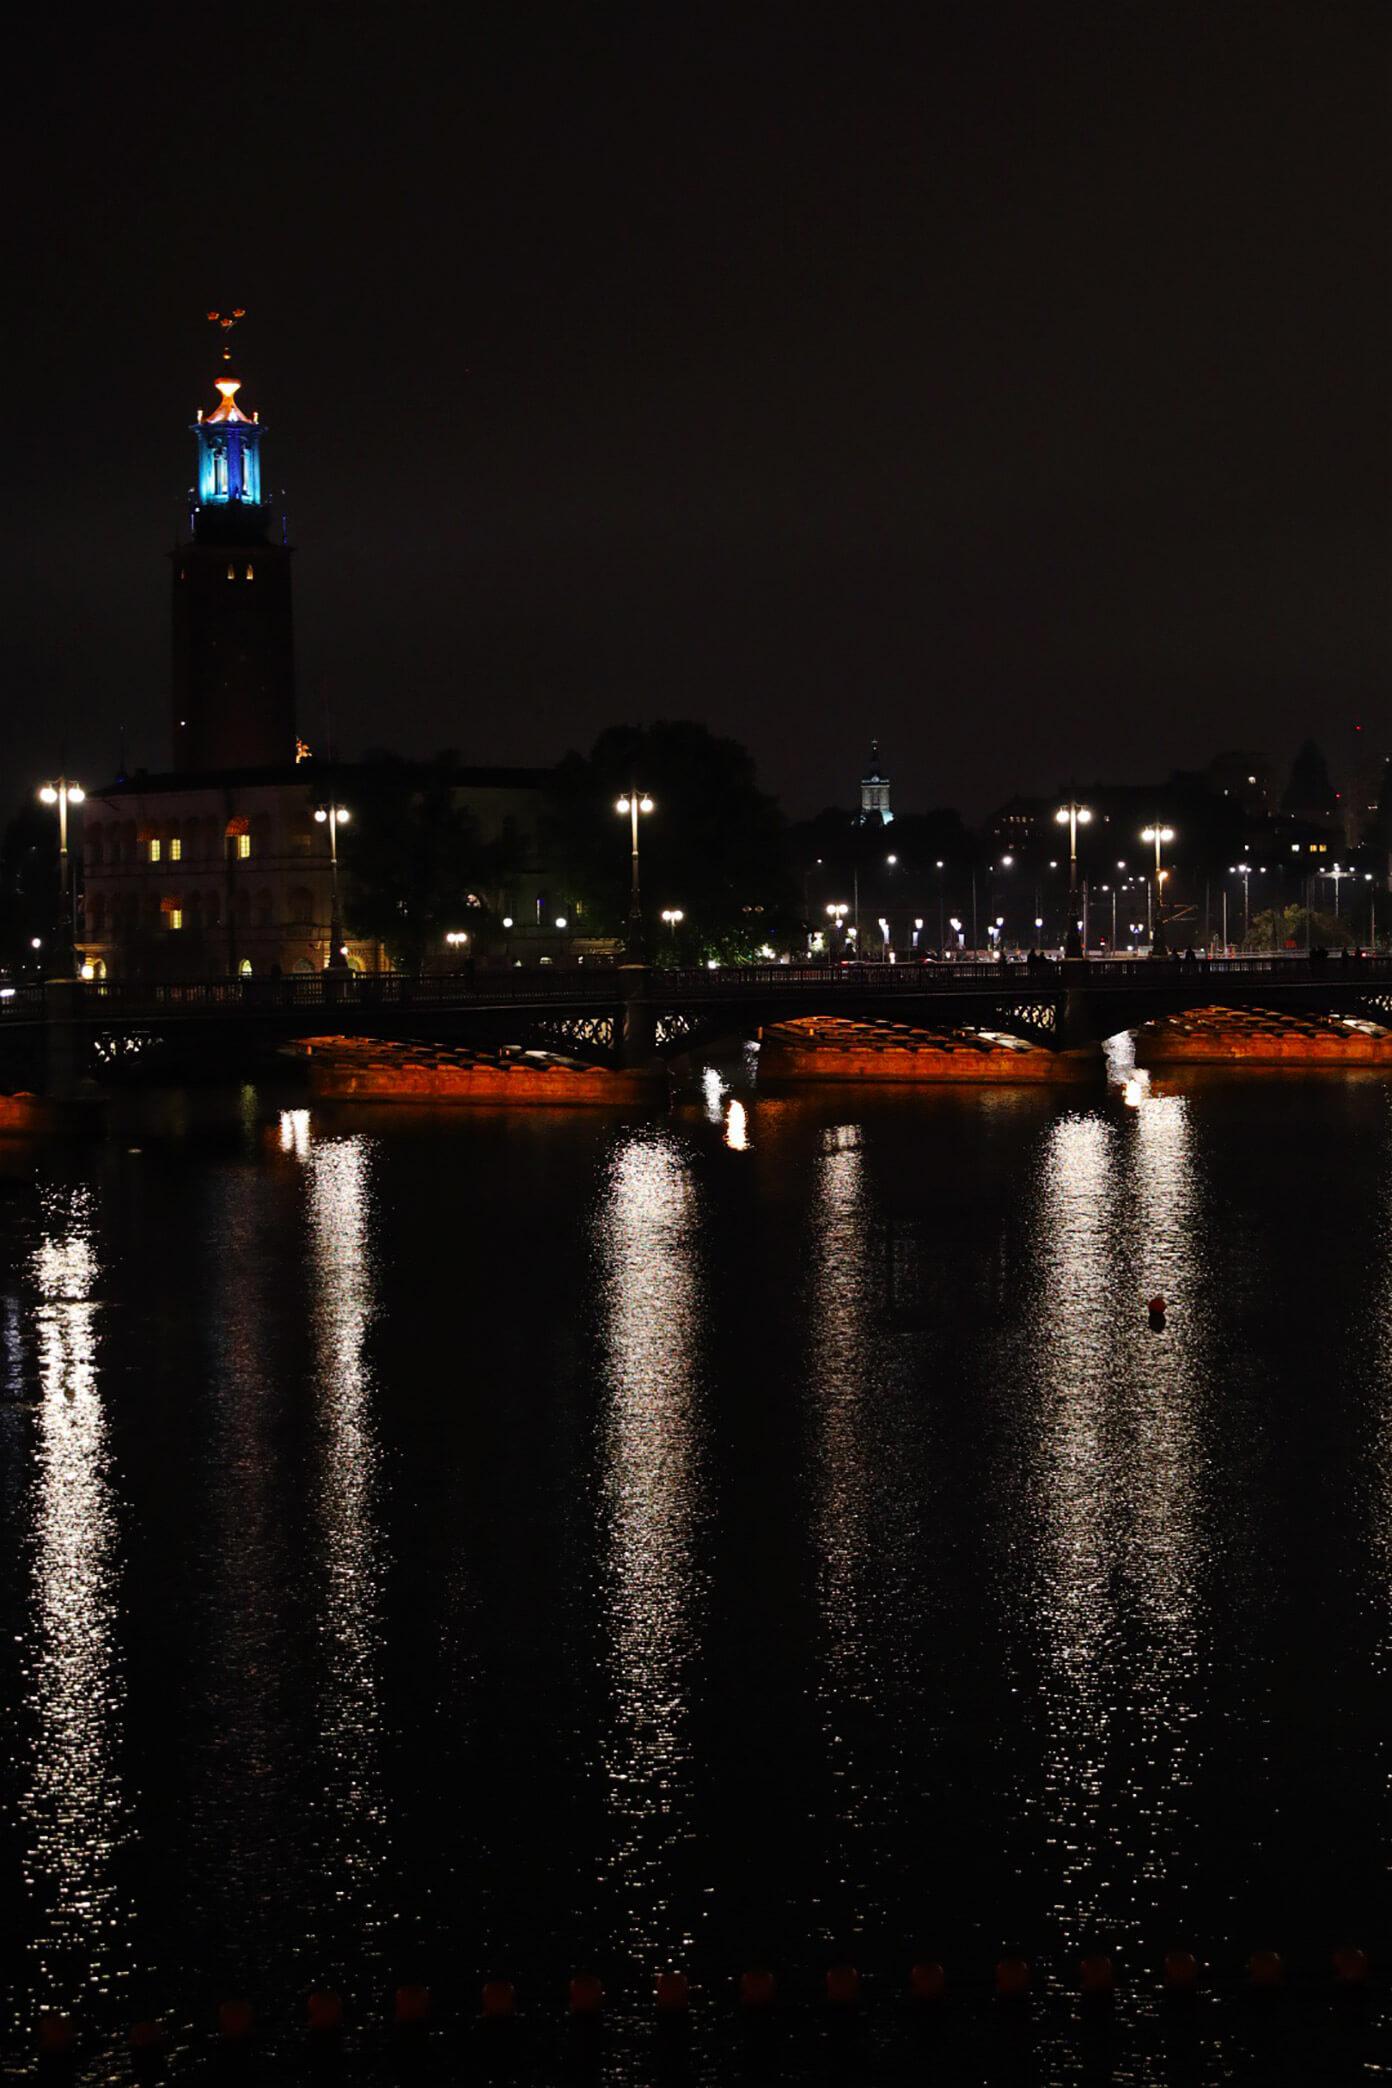 Stockholm, Sweden by Night